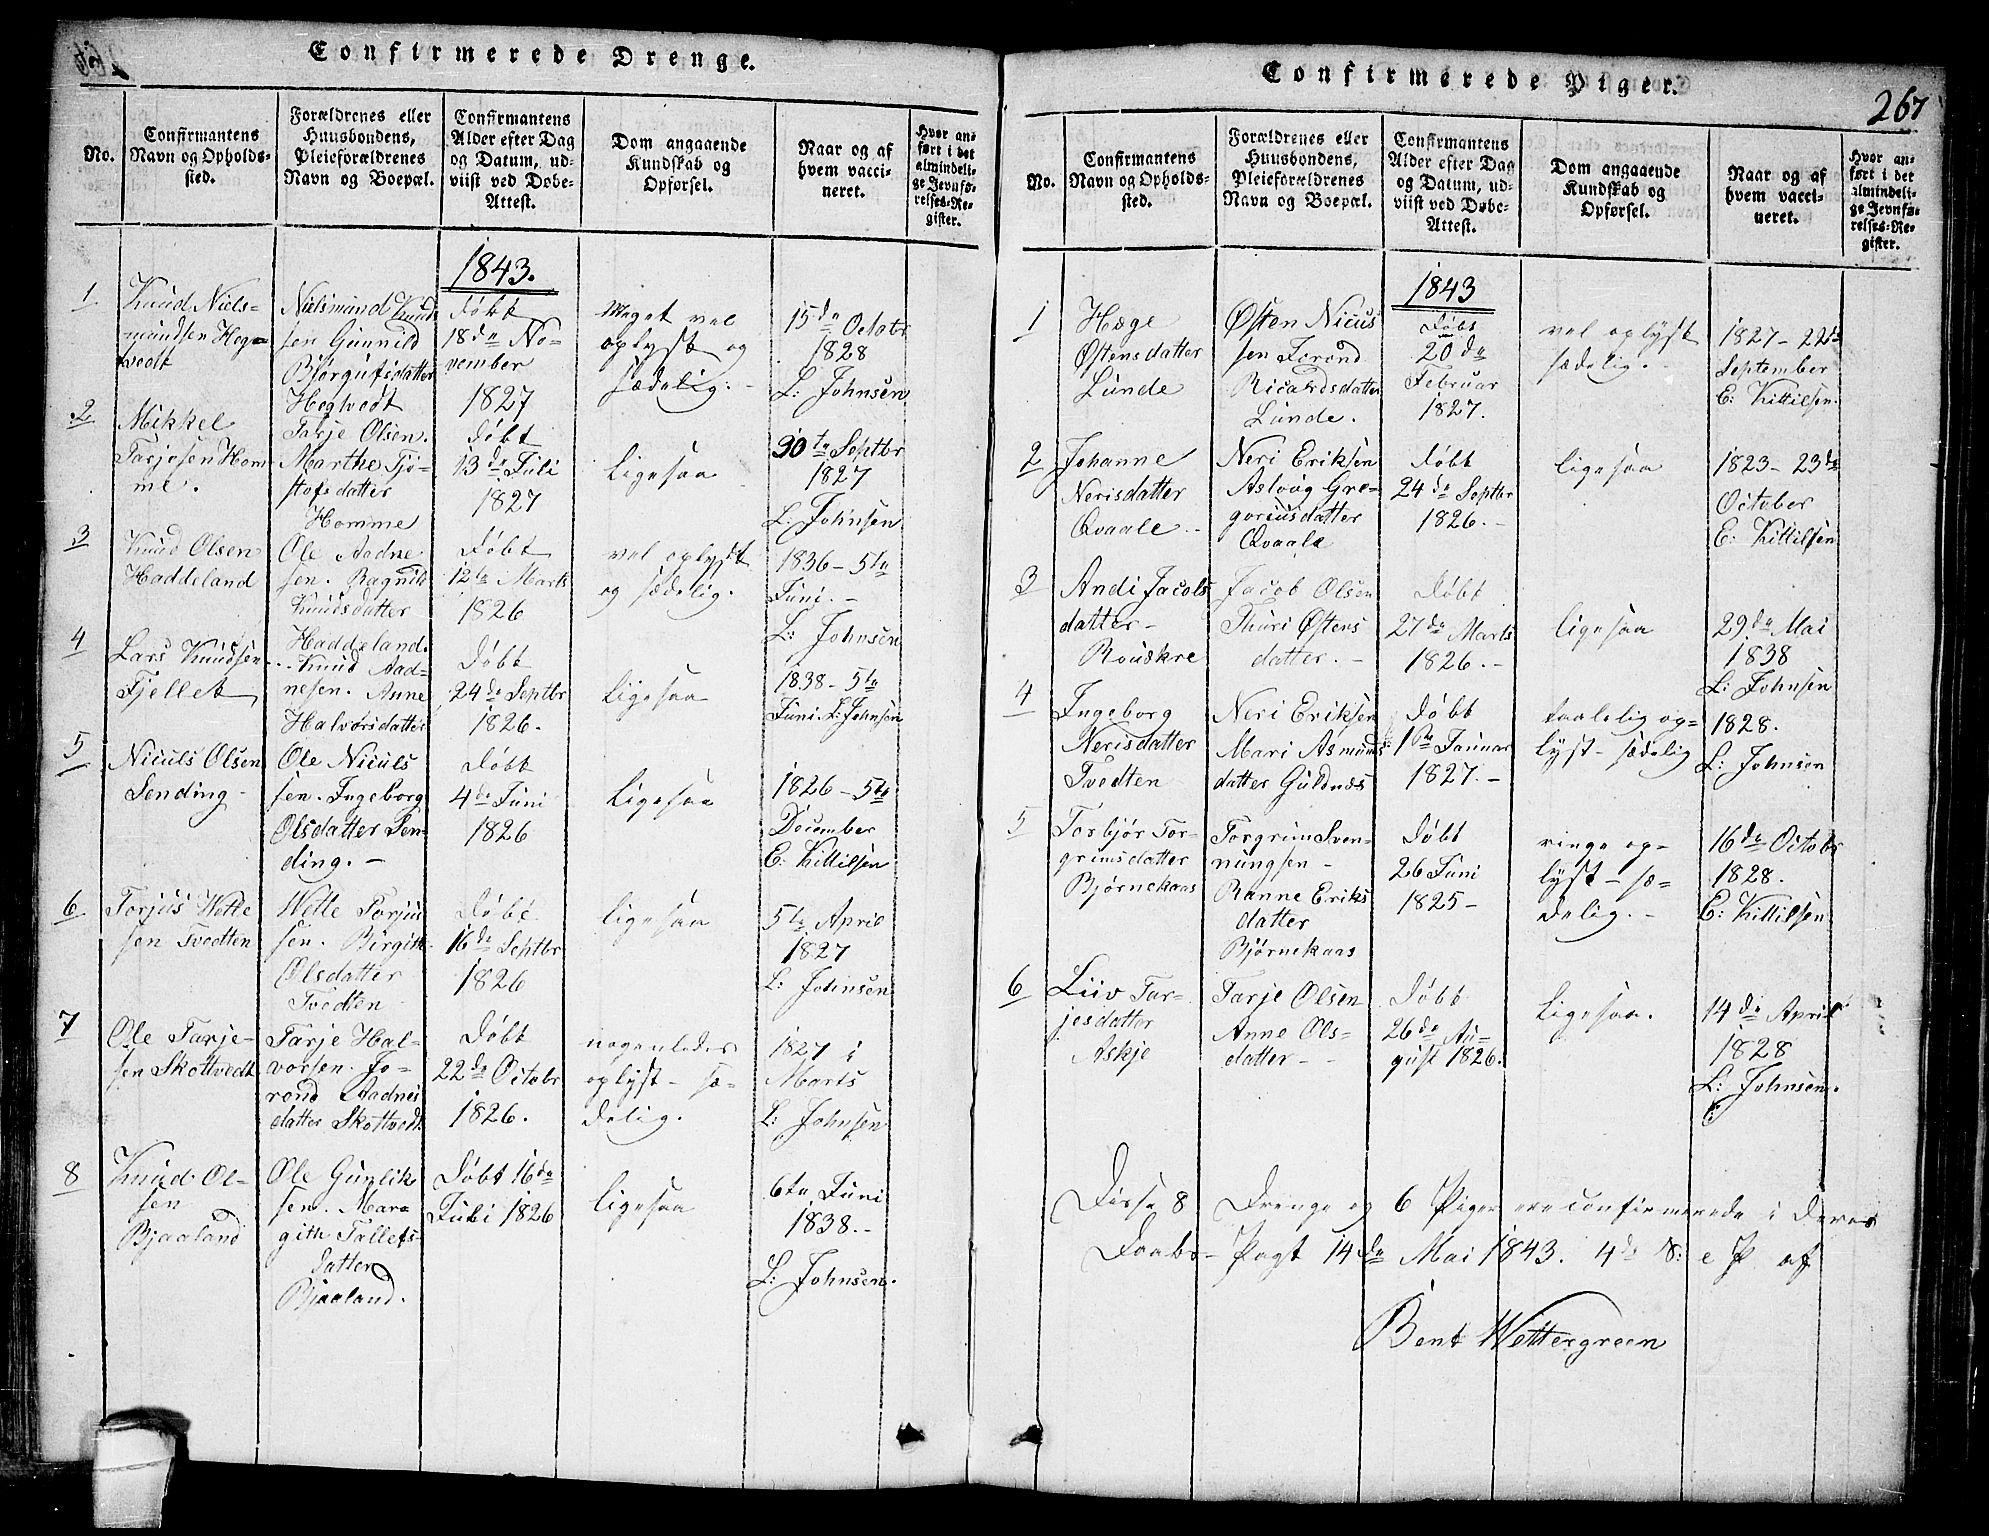 SAKO, Lårdal kirkebøker, G/Ga/L0001: Klokkerbok nr. I 1, 1815-1861, s. 267